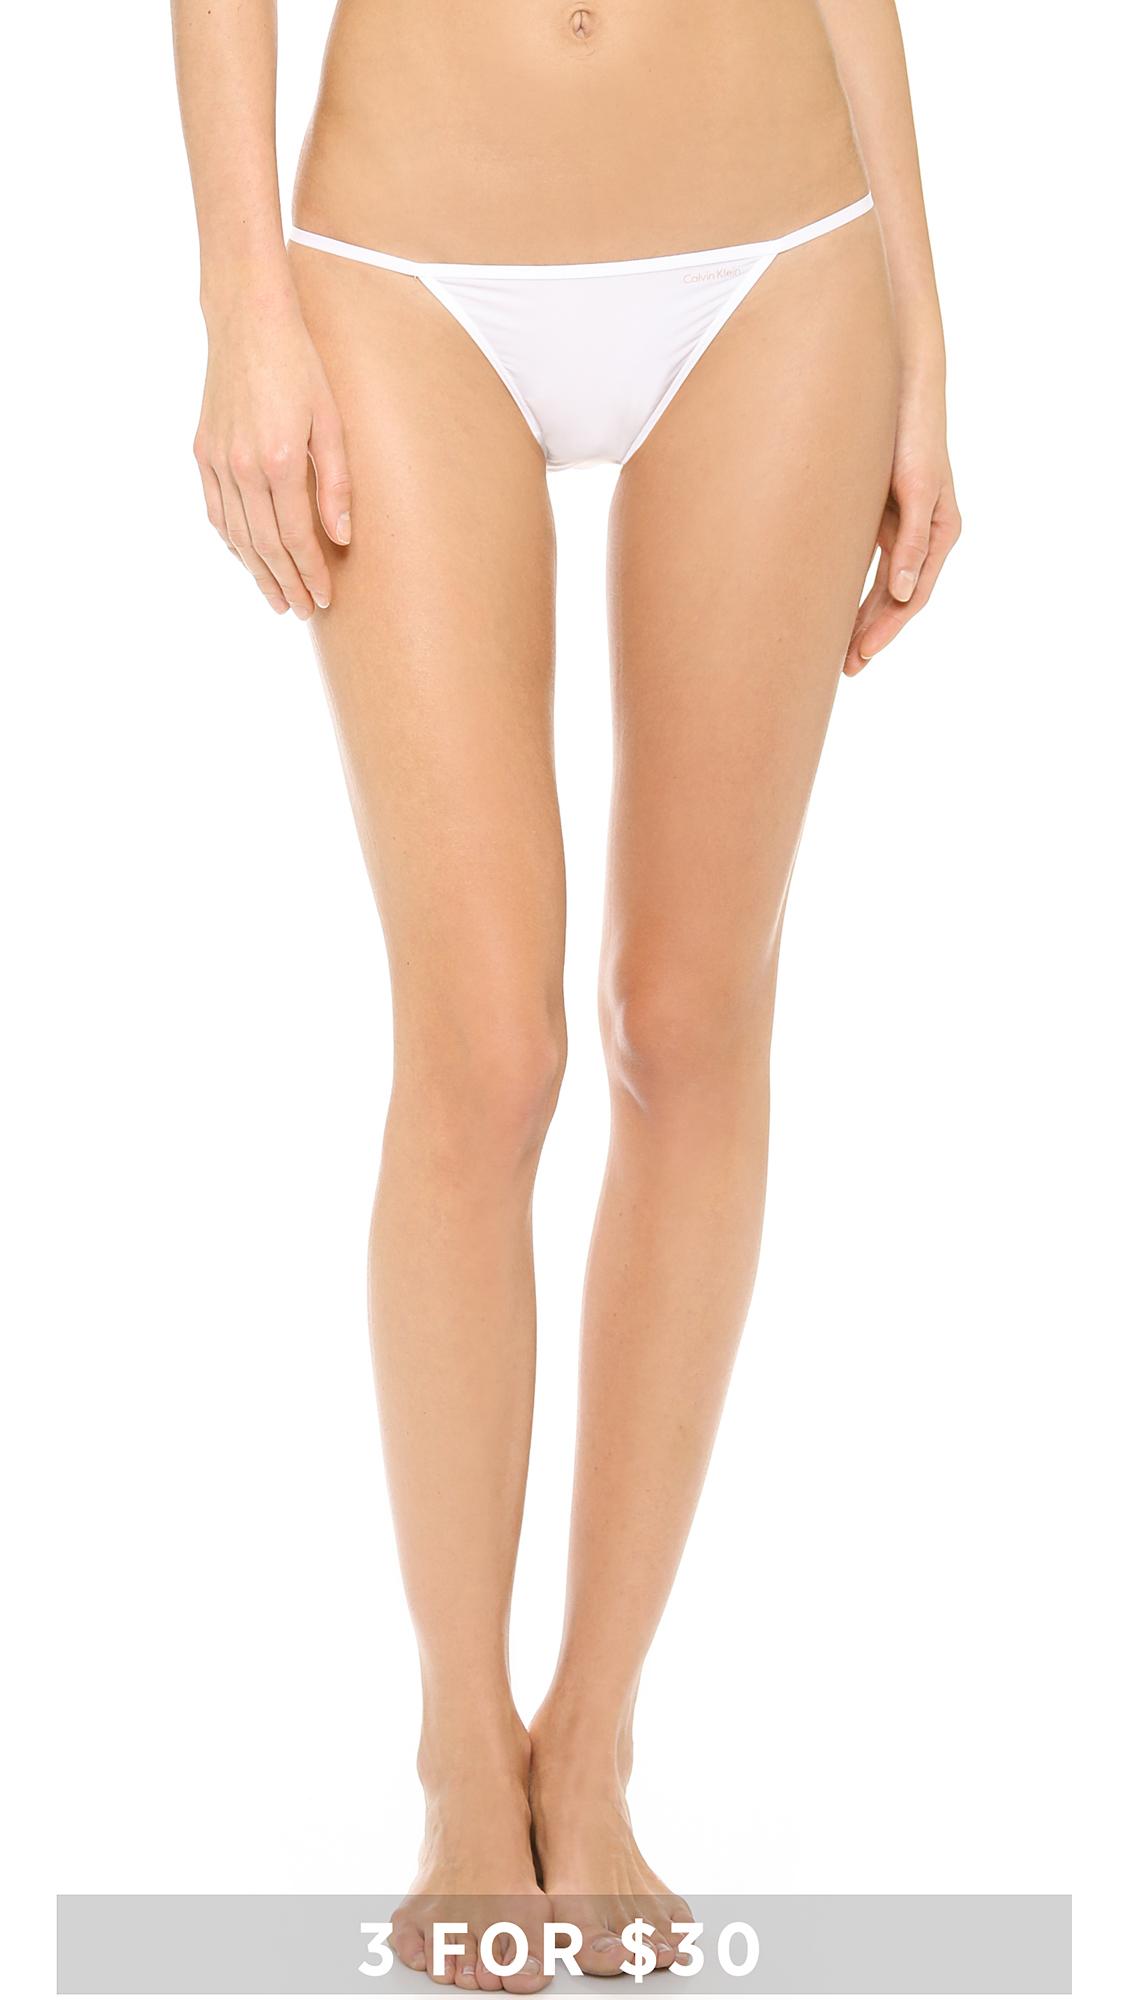 Calvin klein string bikini underwear